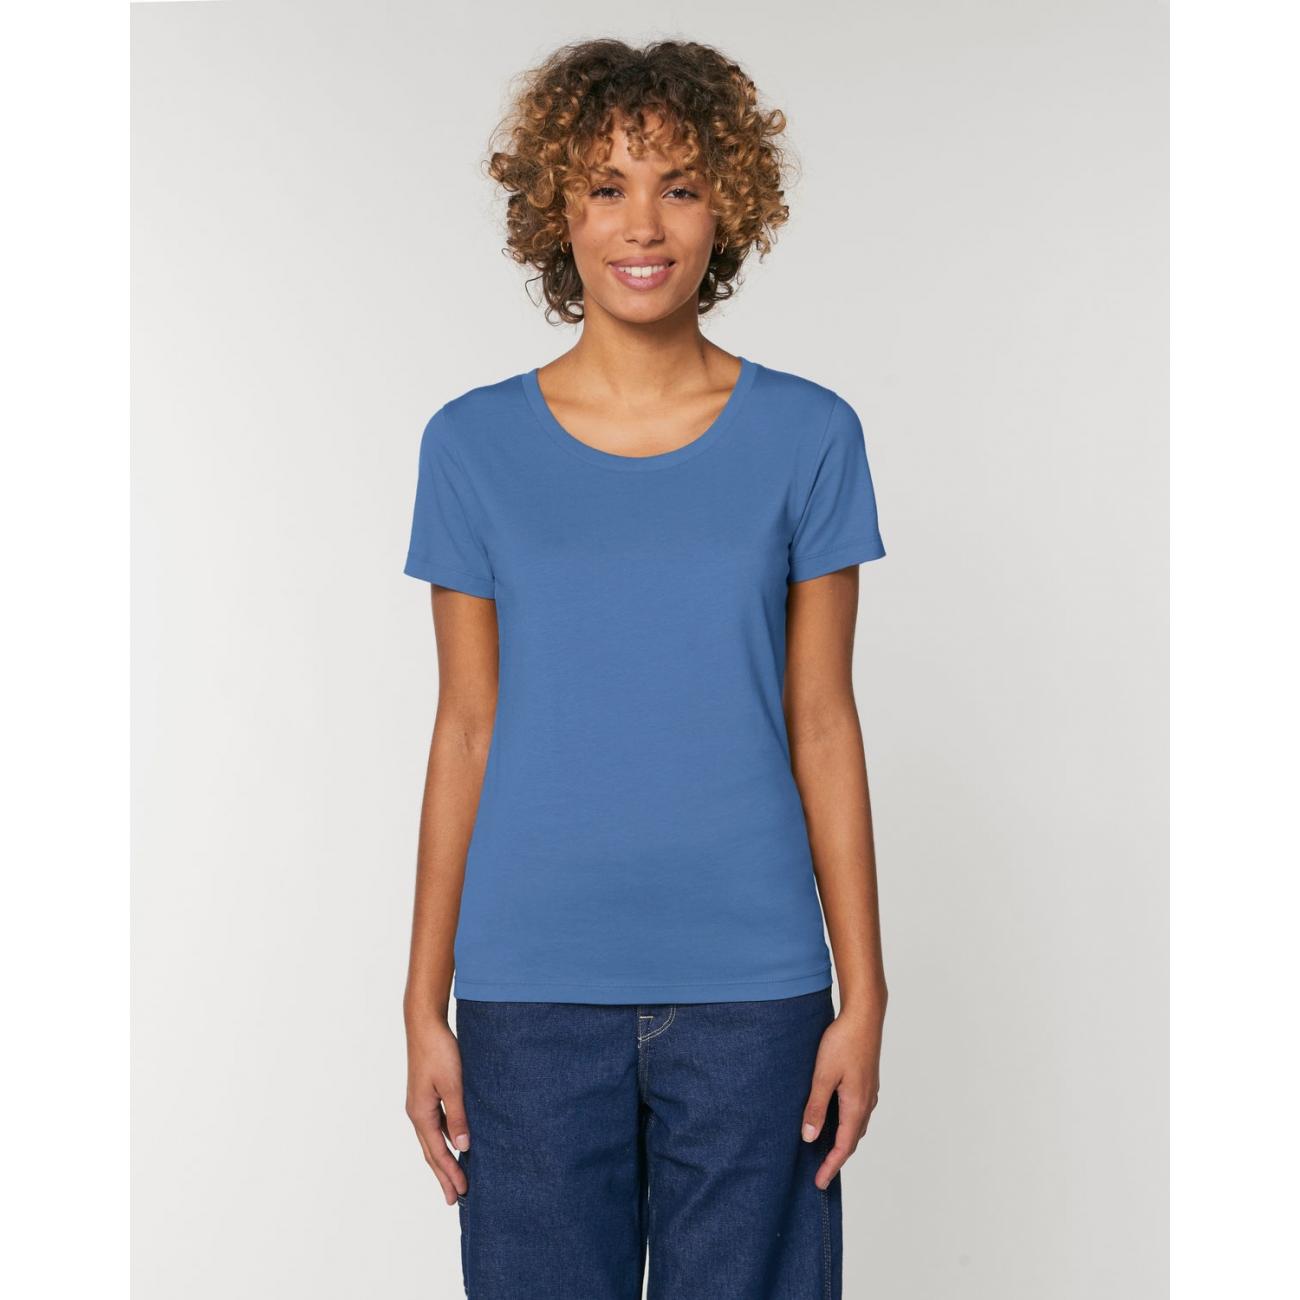 https://tee-shirt-bio.com/10168-thickbox_default/tee-shirt-femme-coton-bio-coupe-feminine-et-cintree-beau-bleu-lumineux.jpg